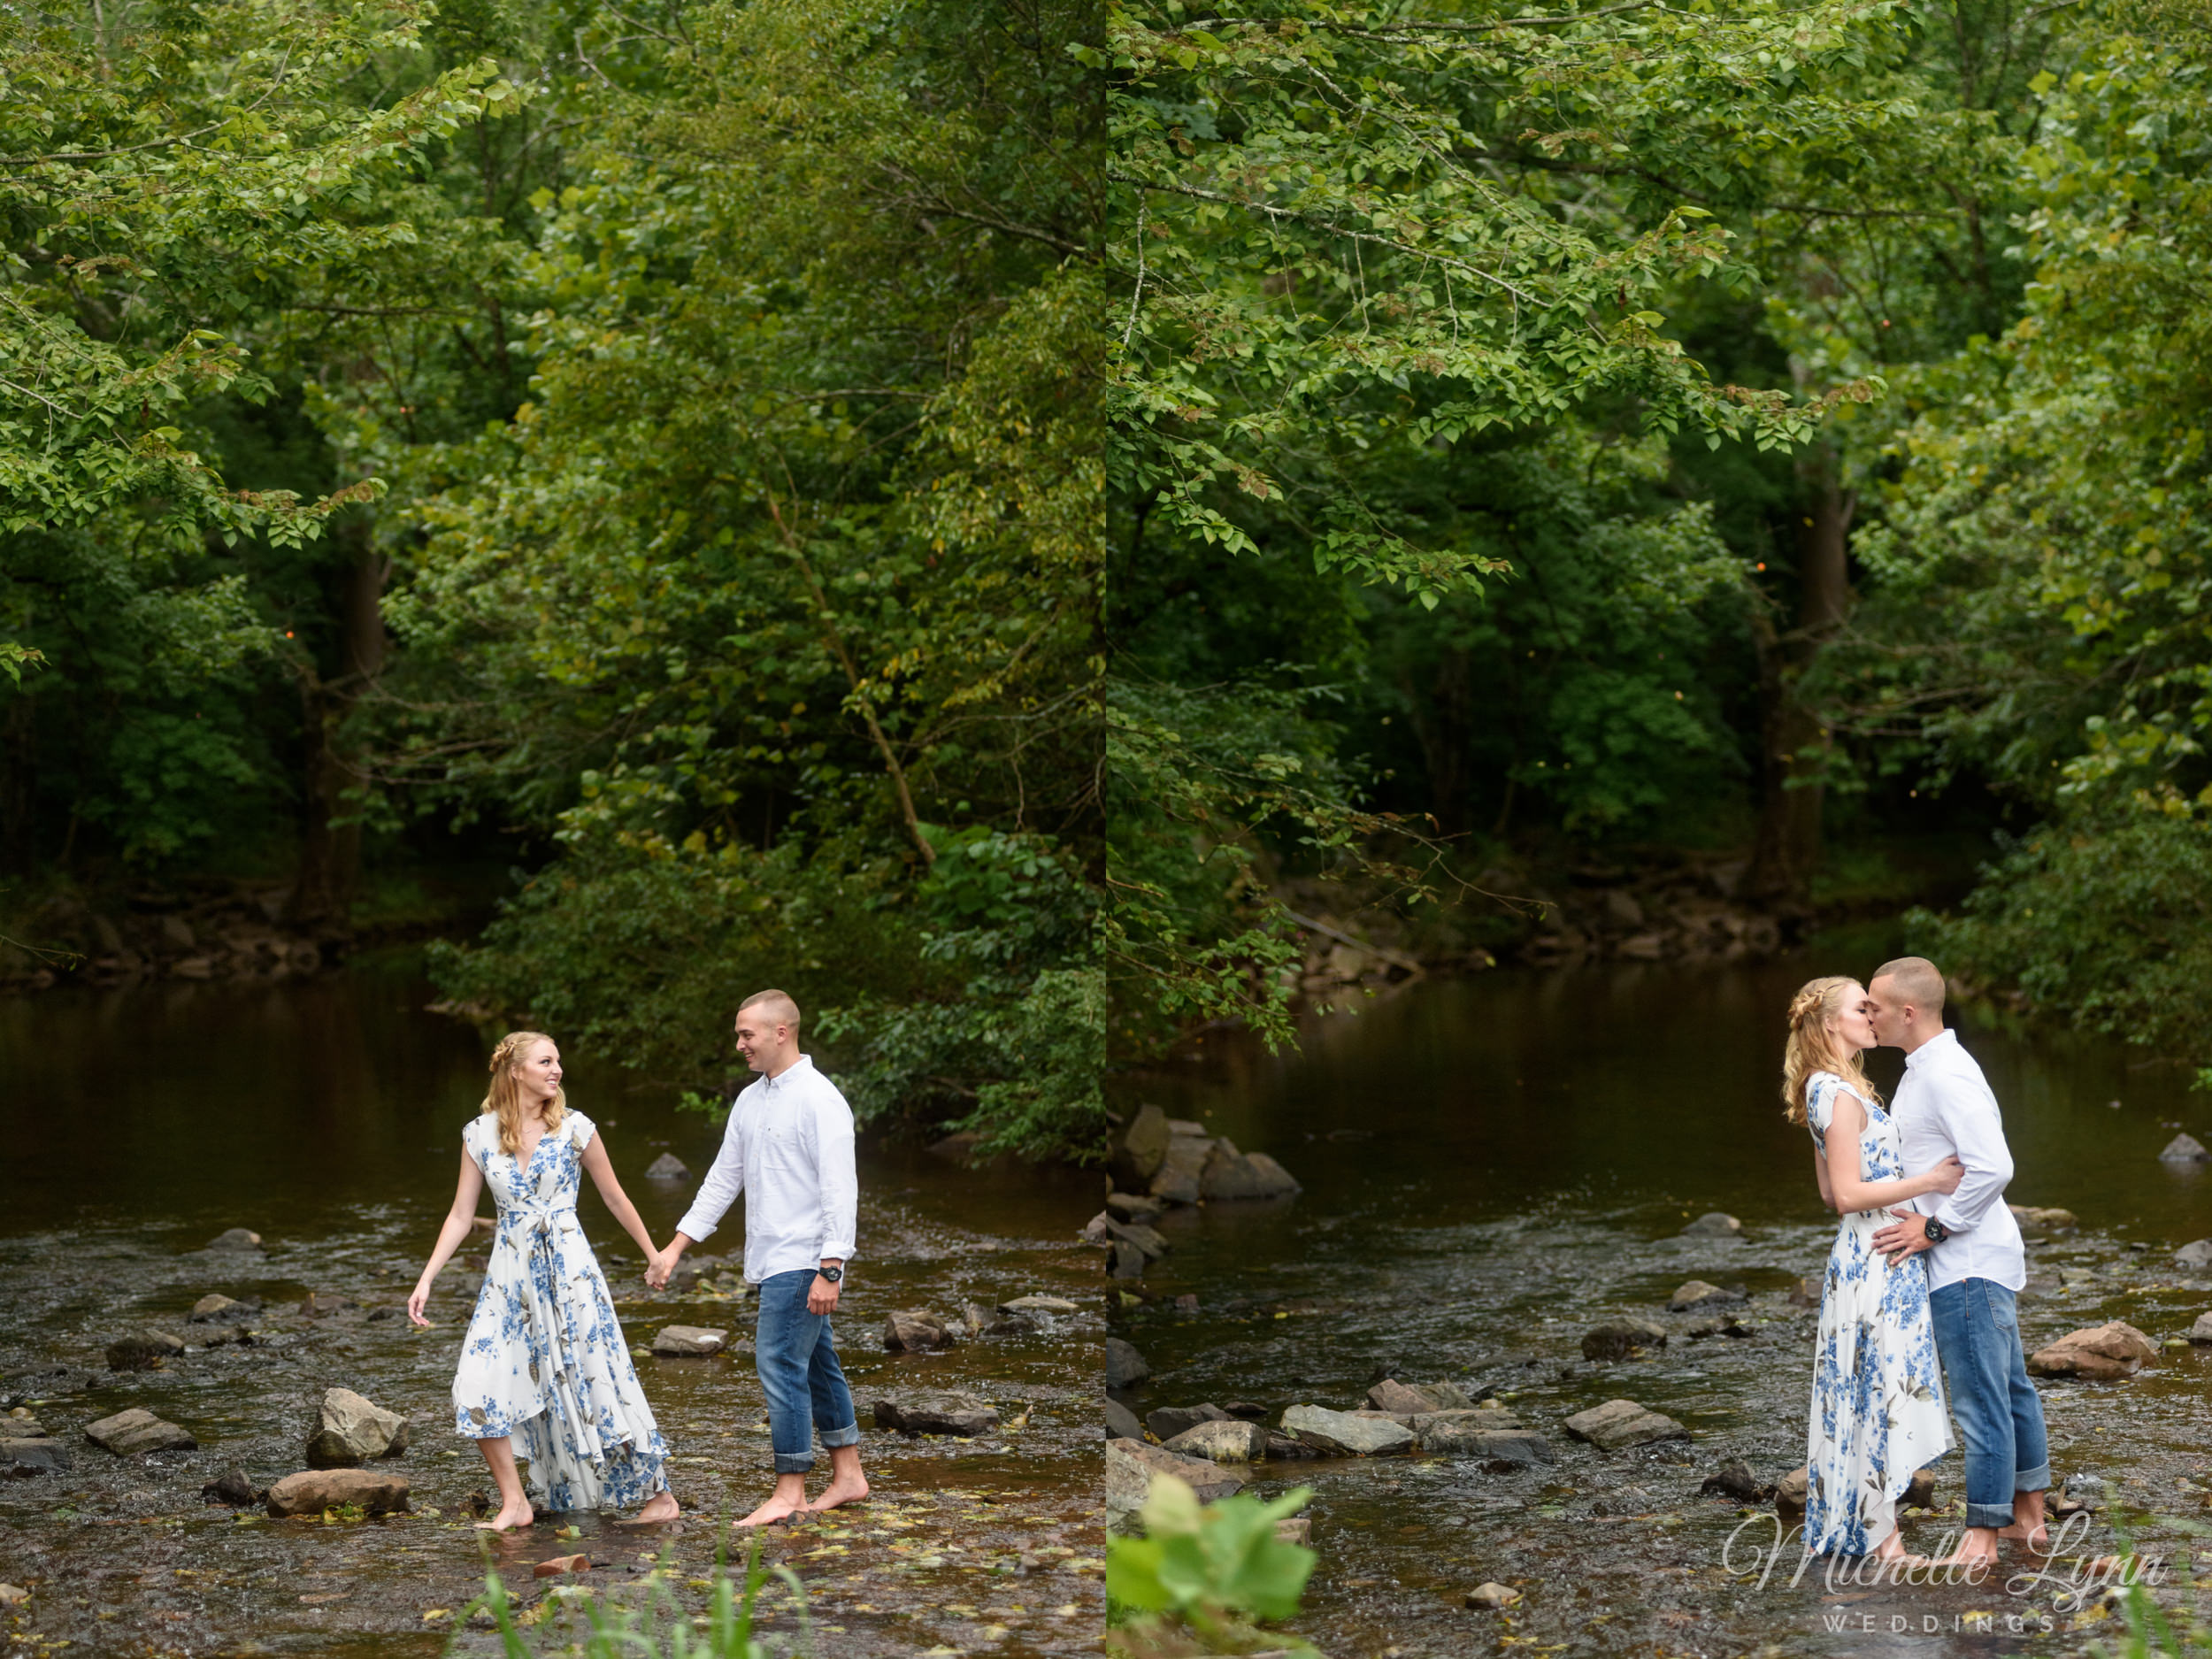 mlw-fischers-park-engagement-photography-25.jpg